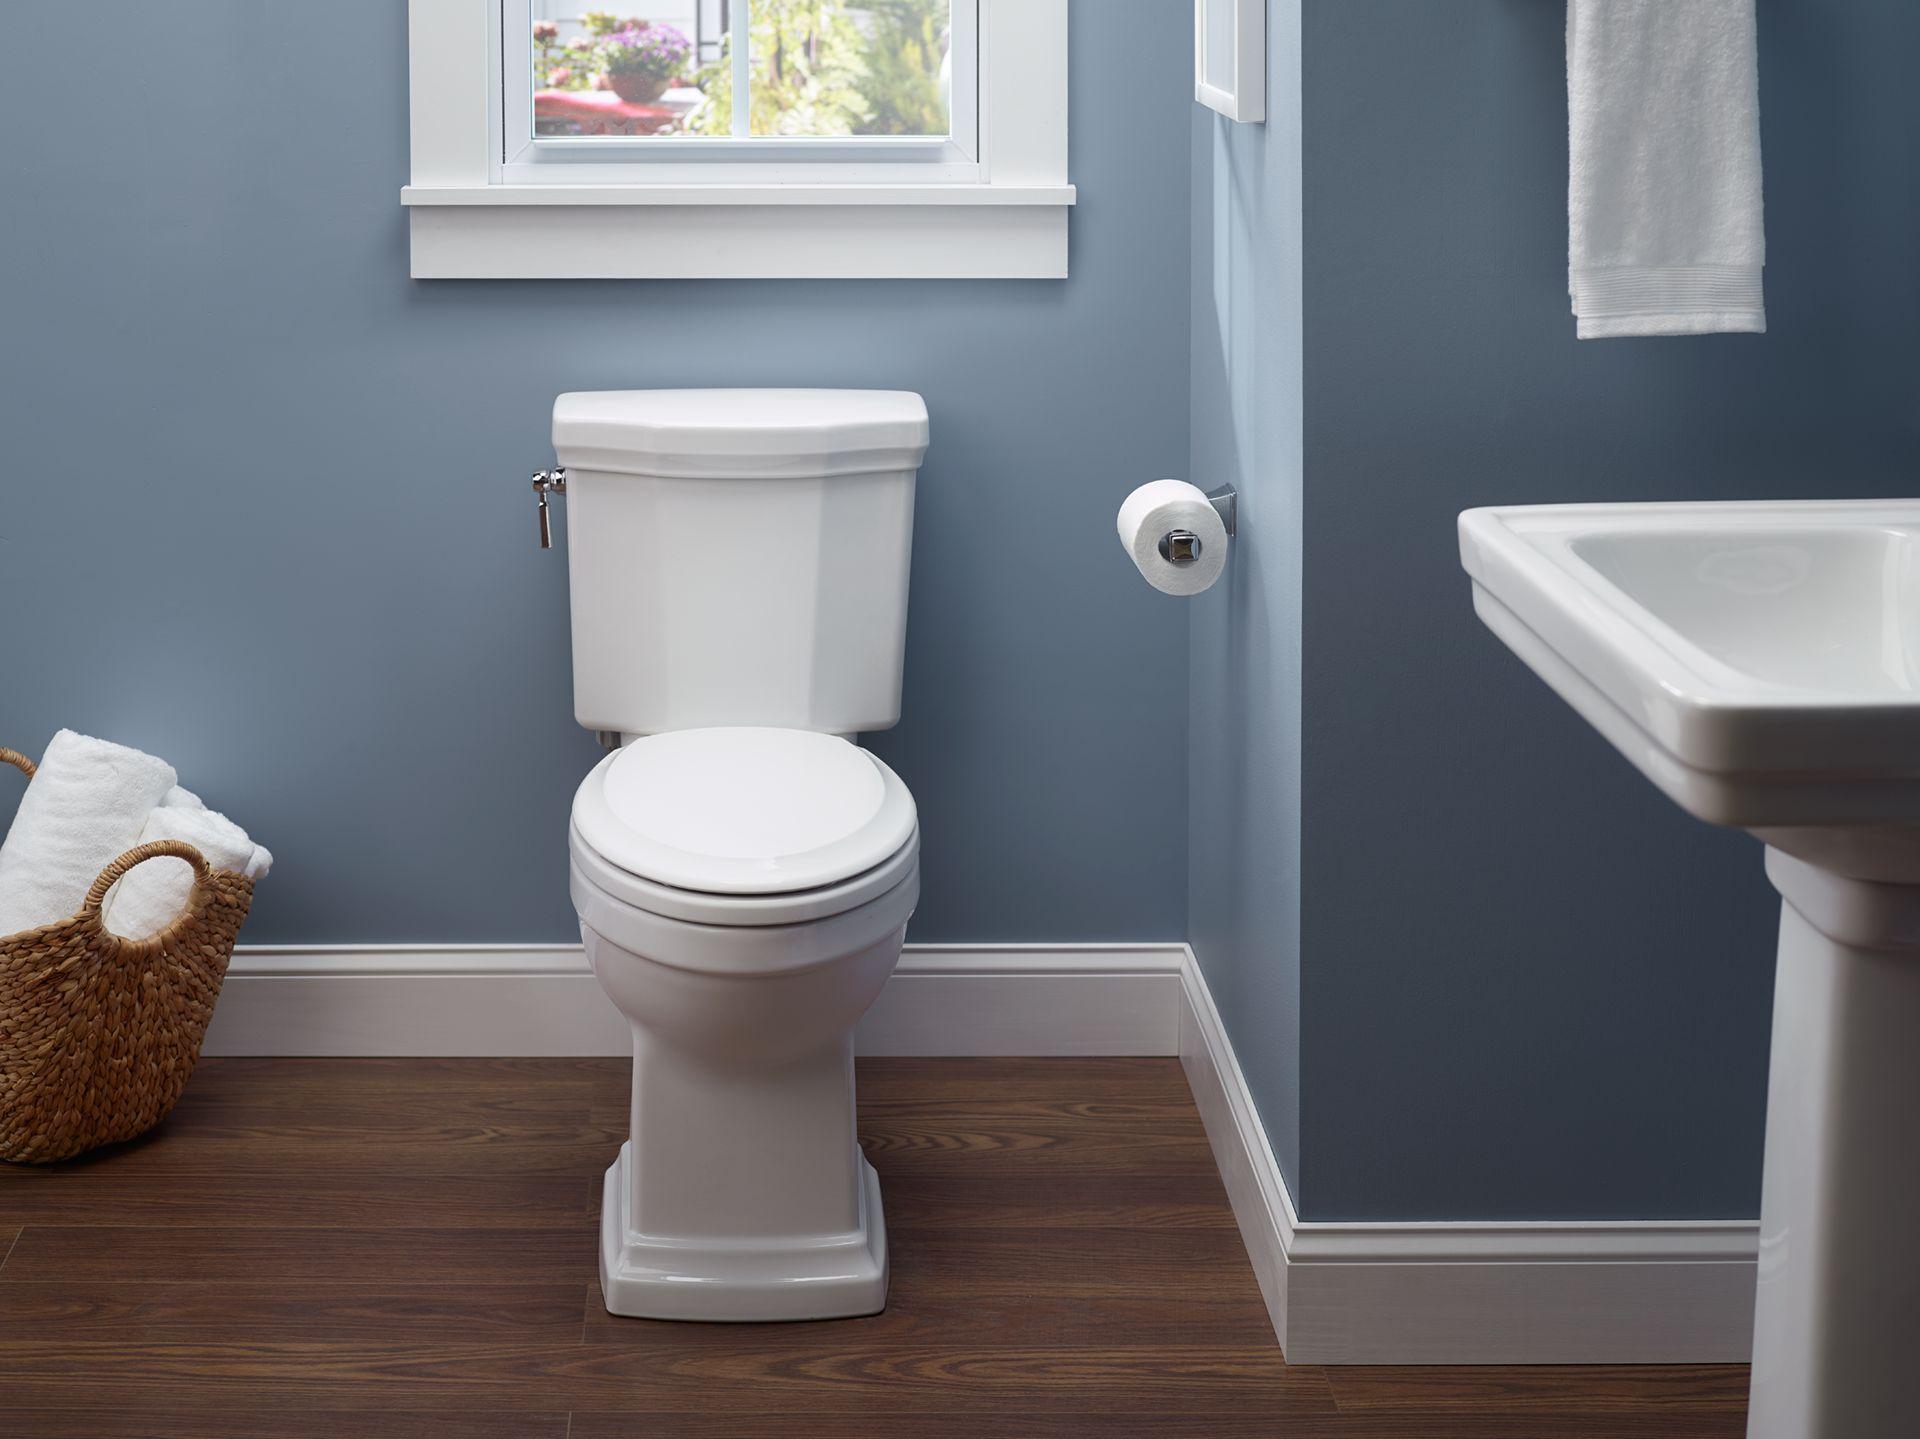 Promenade II Two-Piece Toilet 1.28 GPF - TotoUSA.com